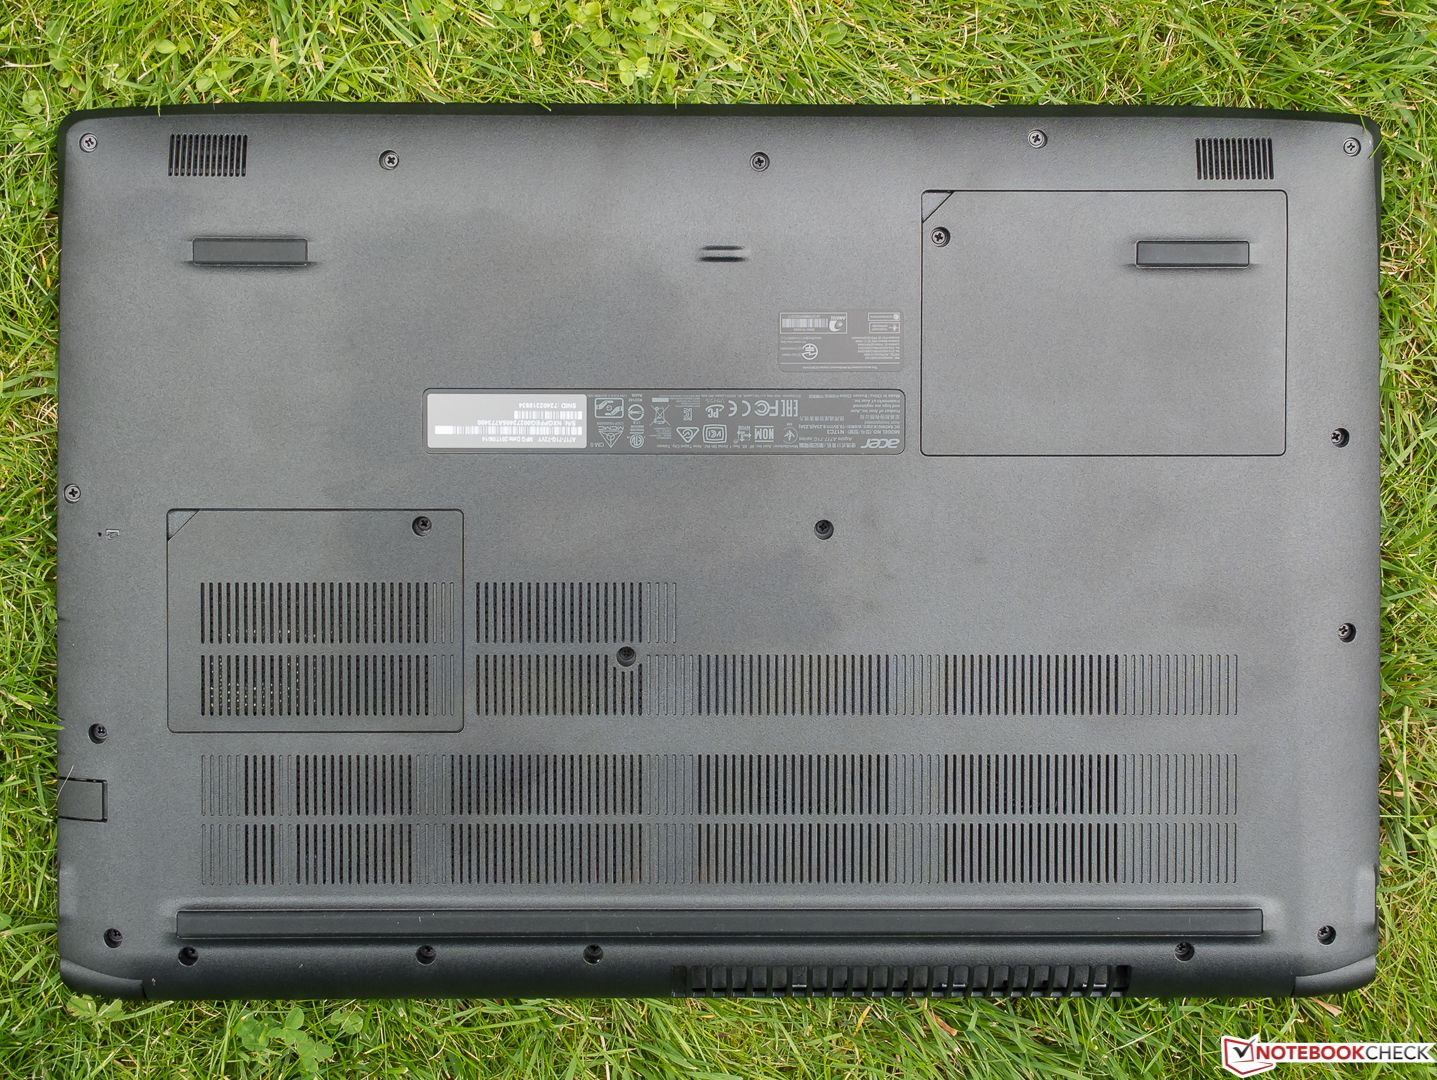 Acer Aspire 7 (Core i7, GTX 1060) Laptop Review